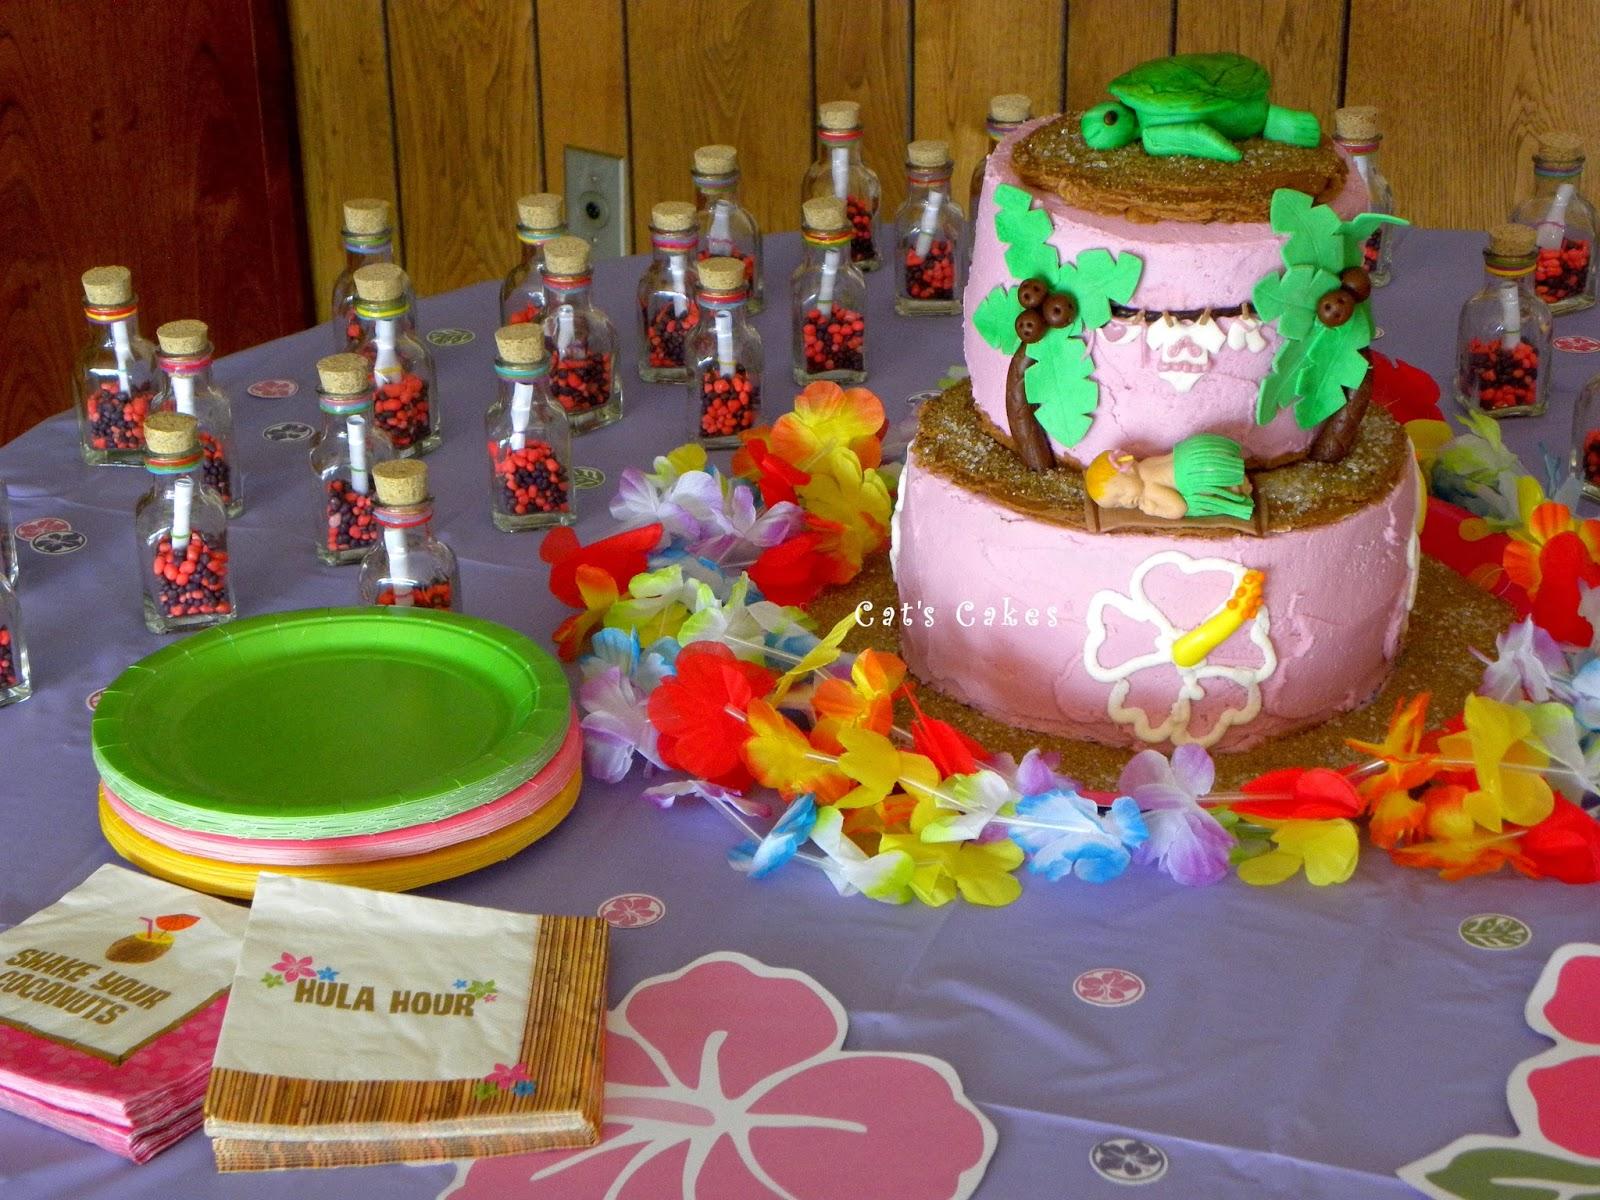 Living Room Decorating Ideas: Luau Baby Shower Cake Ideas